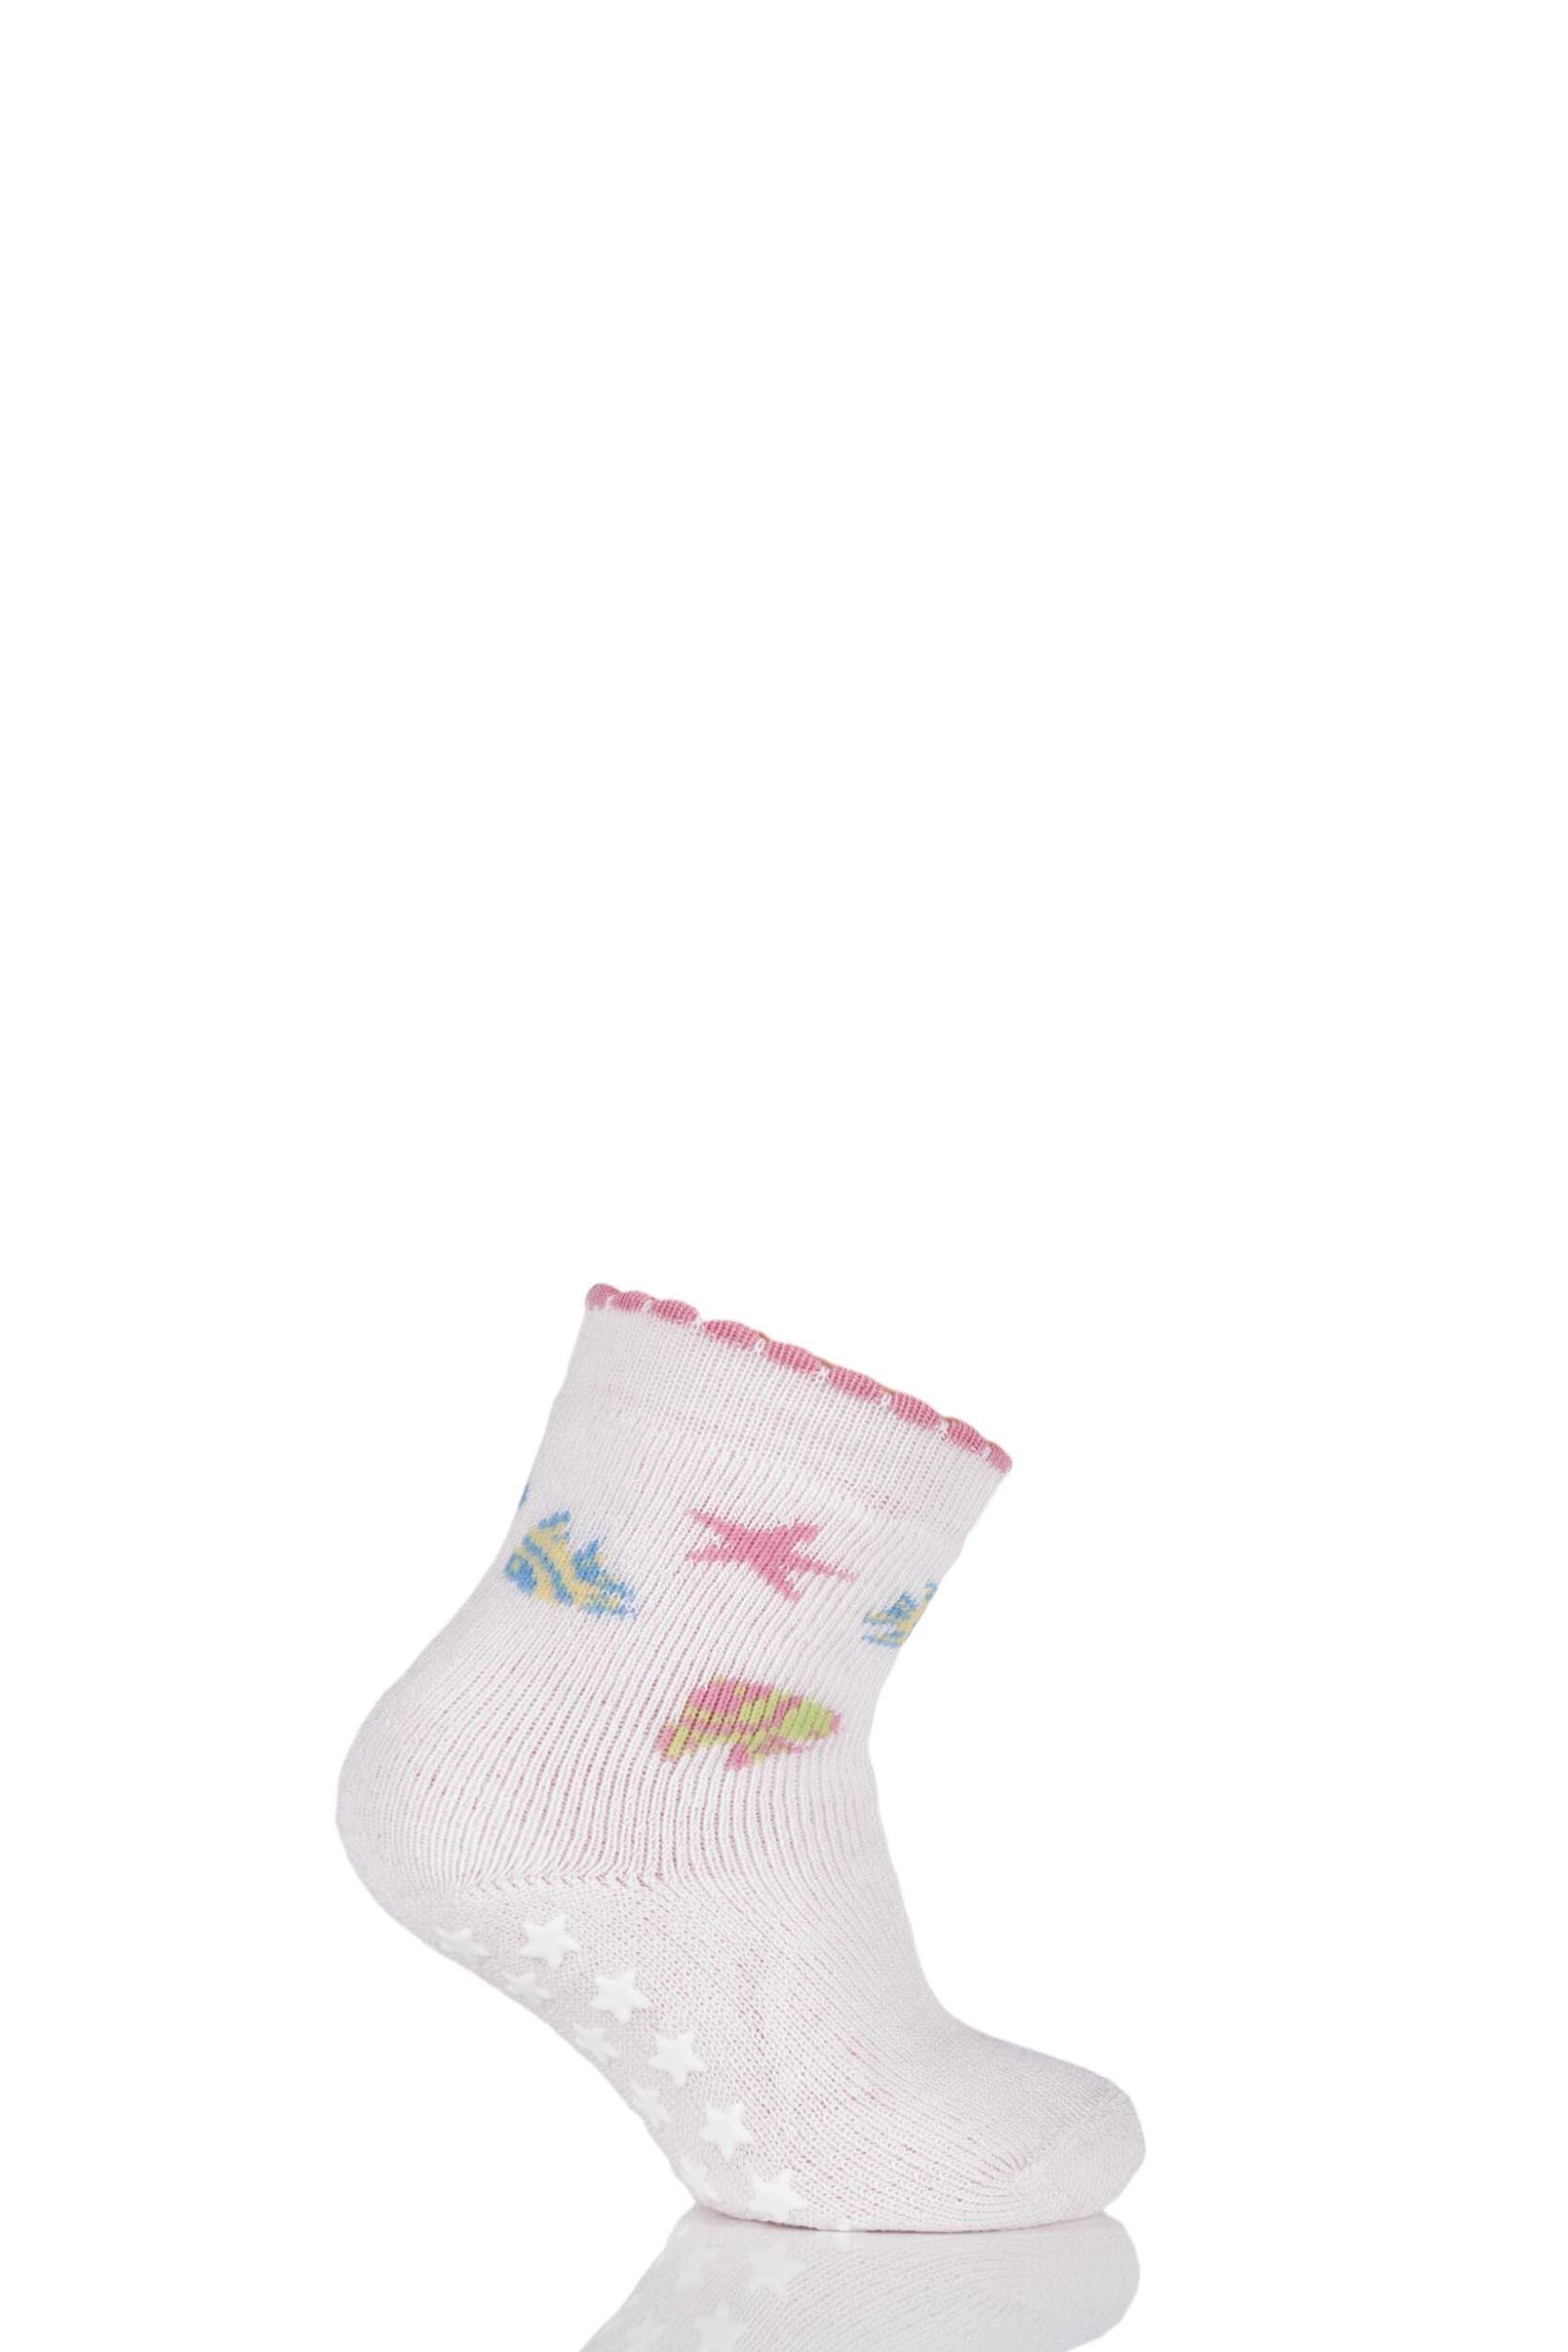 Image of Babies 1 Pair Falke Fish Catspads Socks with Starfish Grip